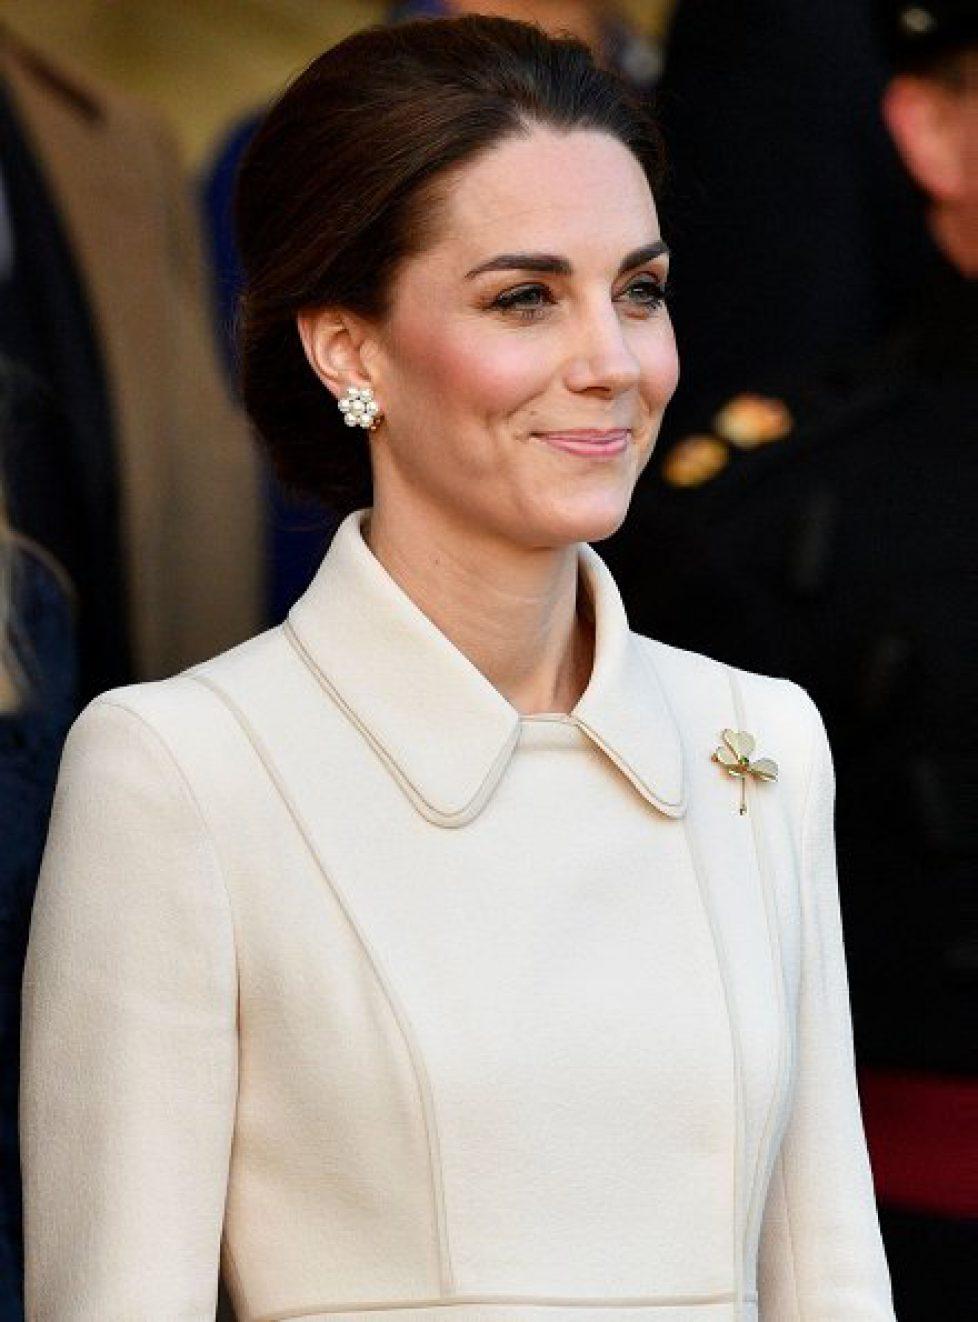 The-Duchess-in-Catherine-Walker-4